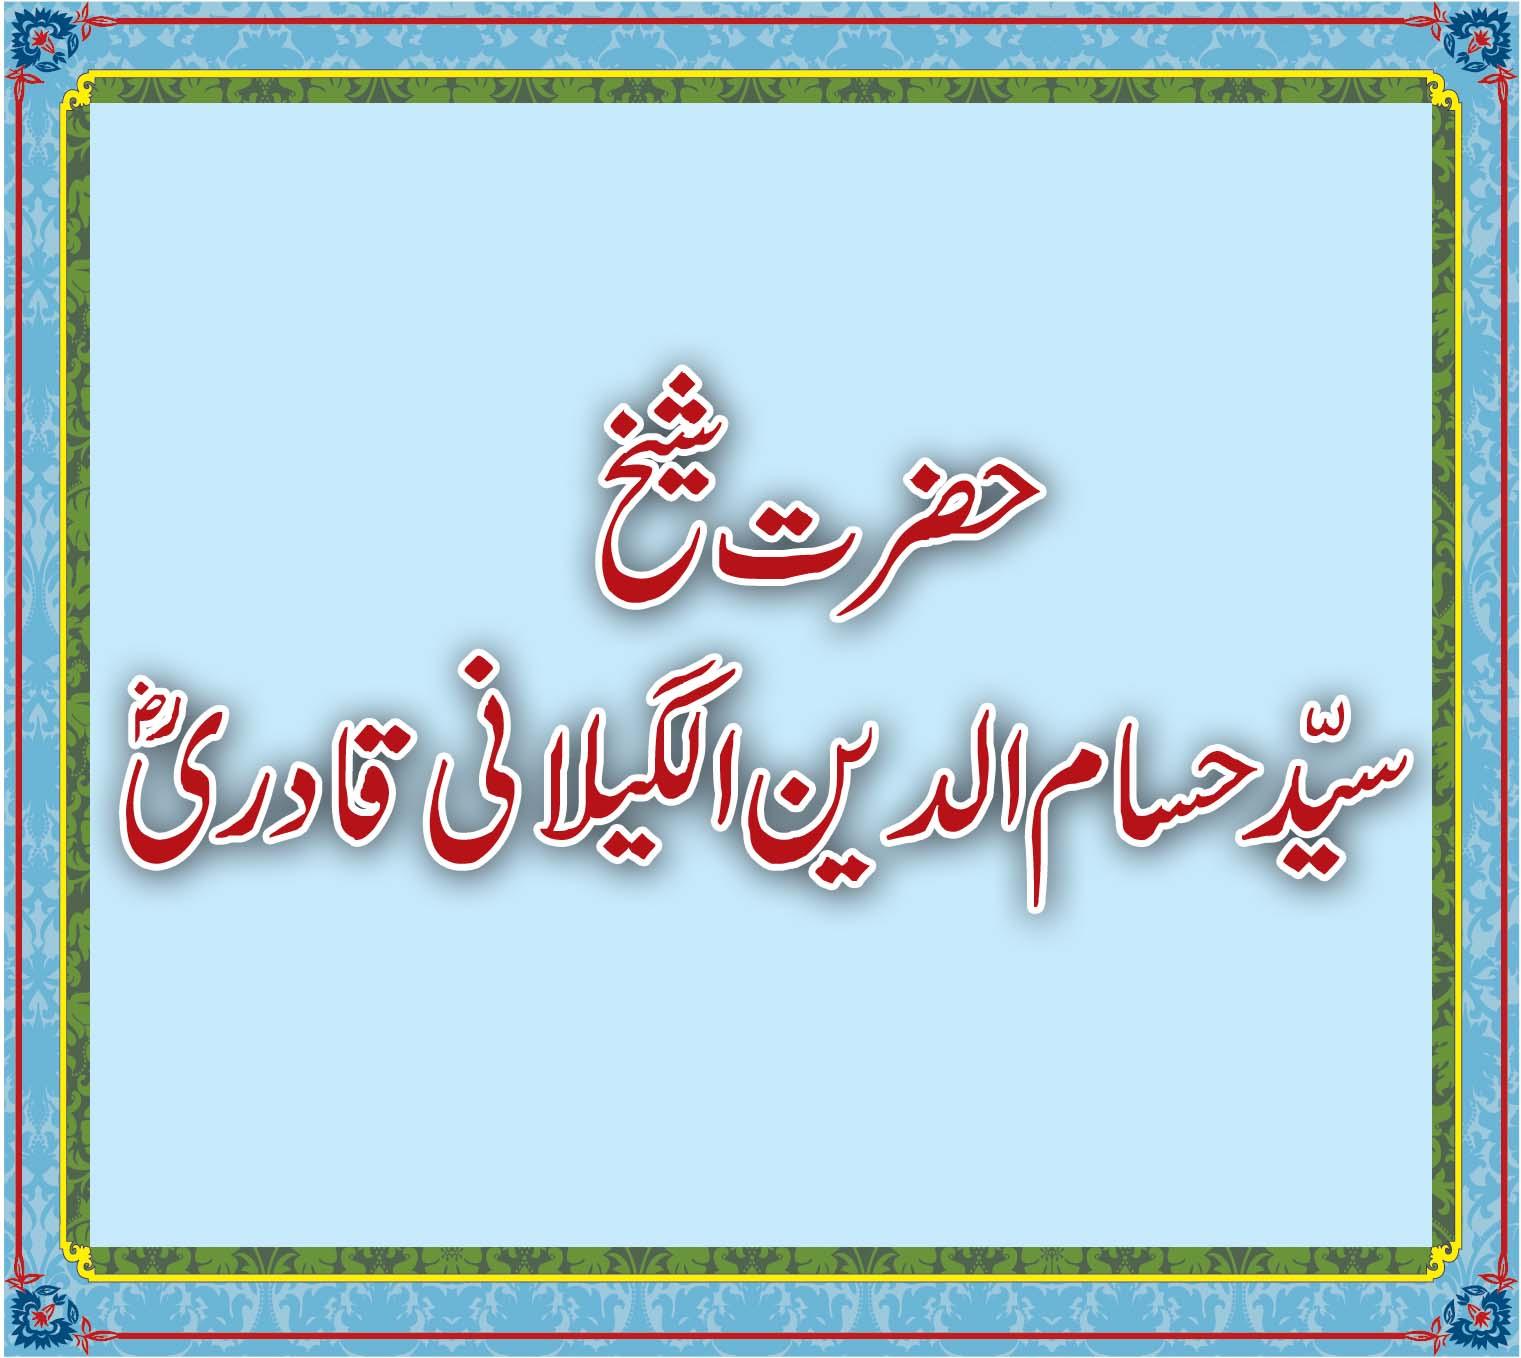 hasssaam